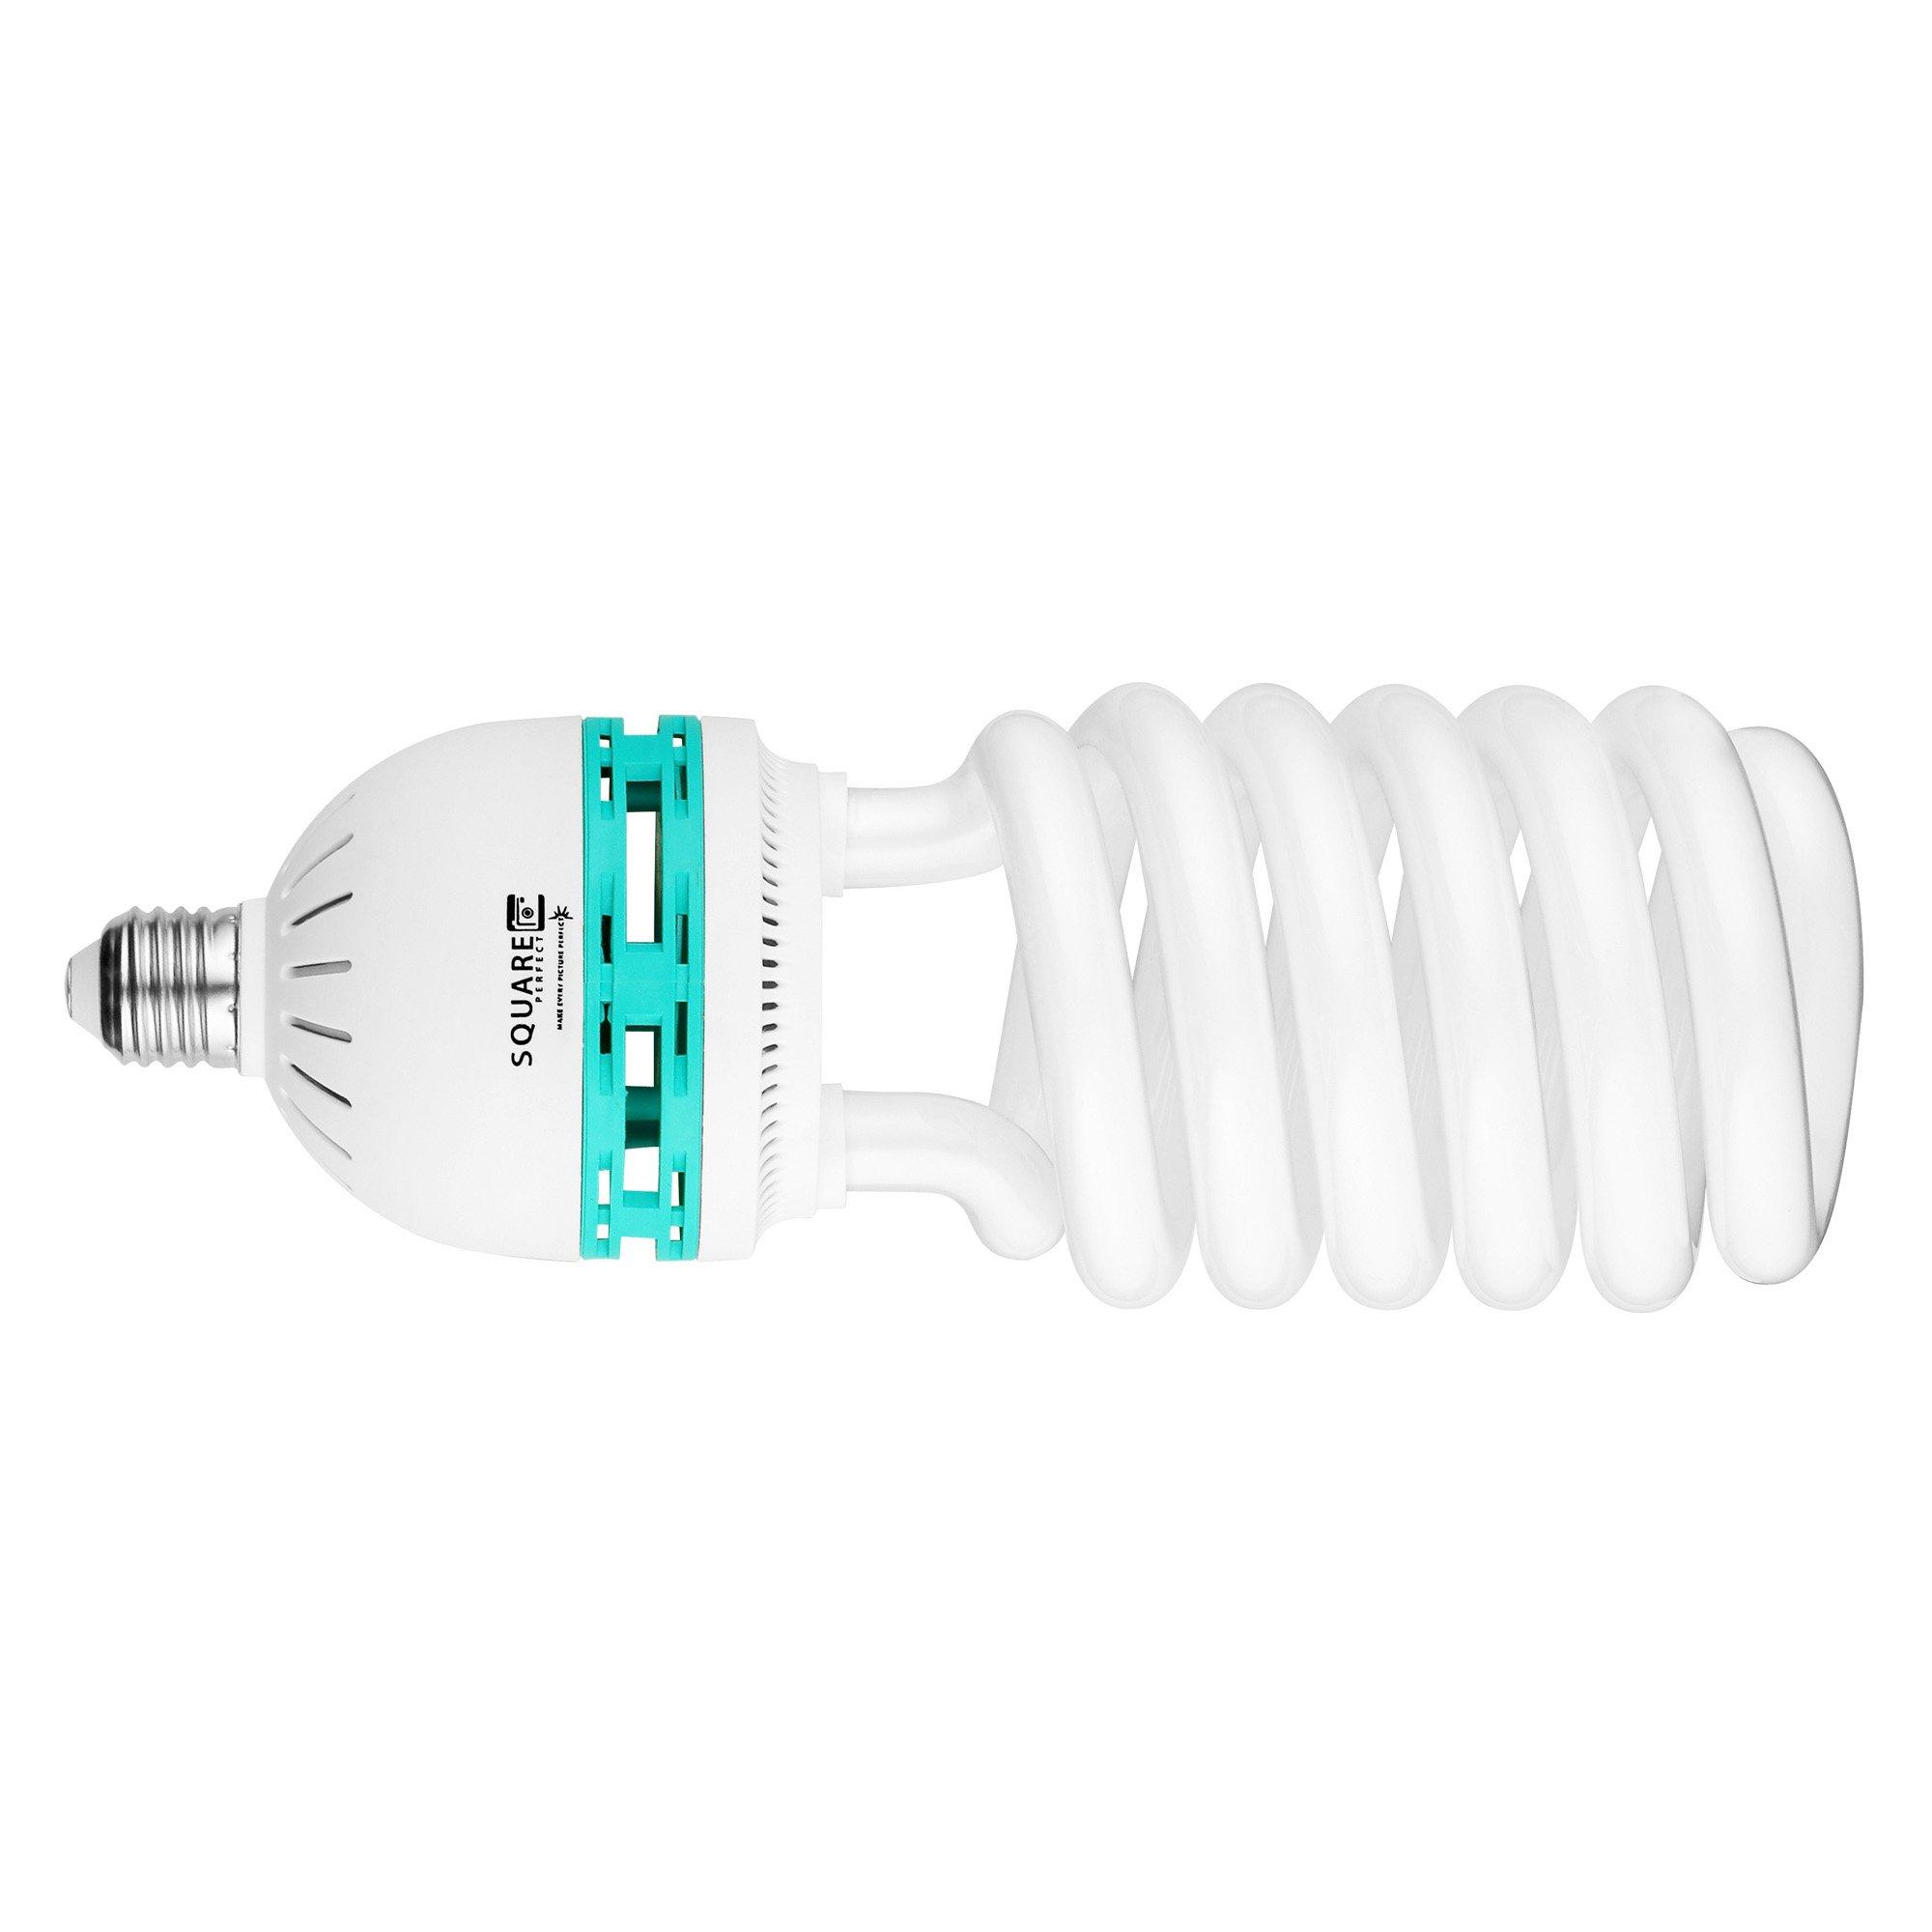 Square Perfect 3080 Professional Quality 100 Watt Compact Fluorescent Full Spectrum Photo Bulb